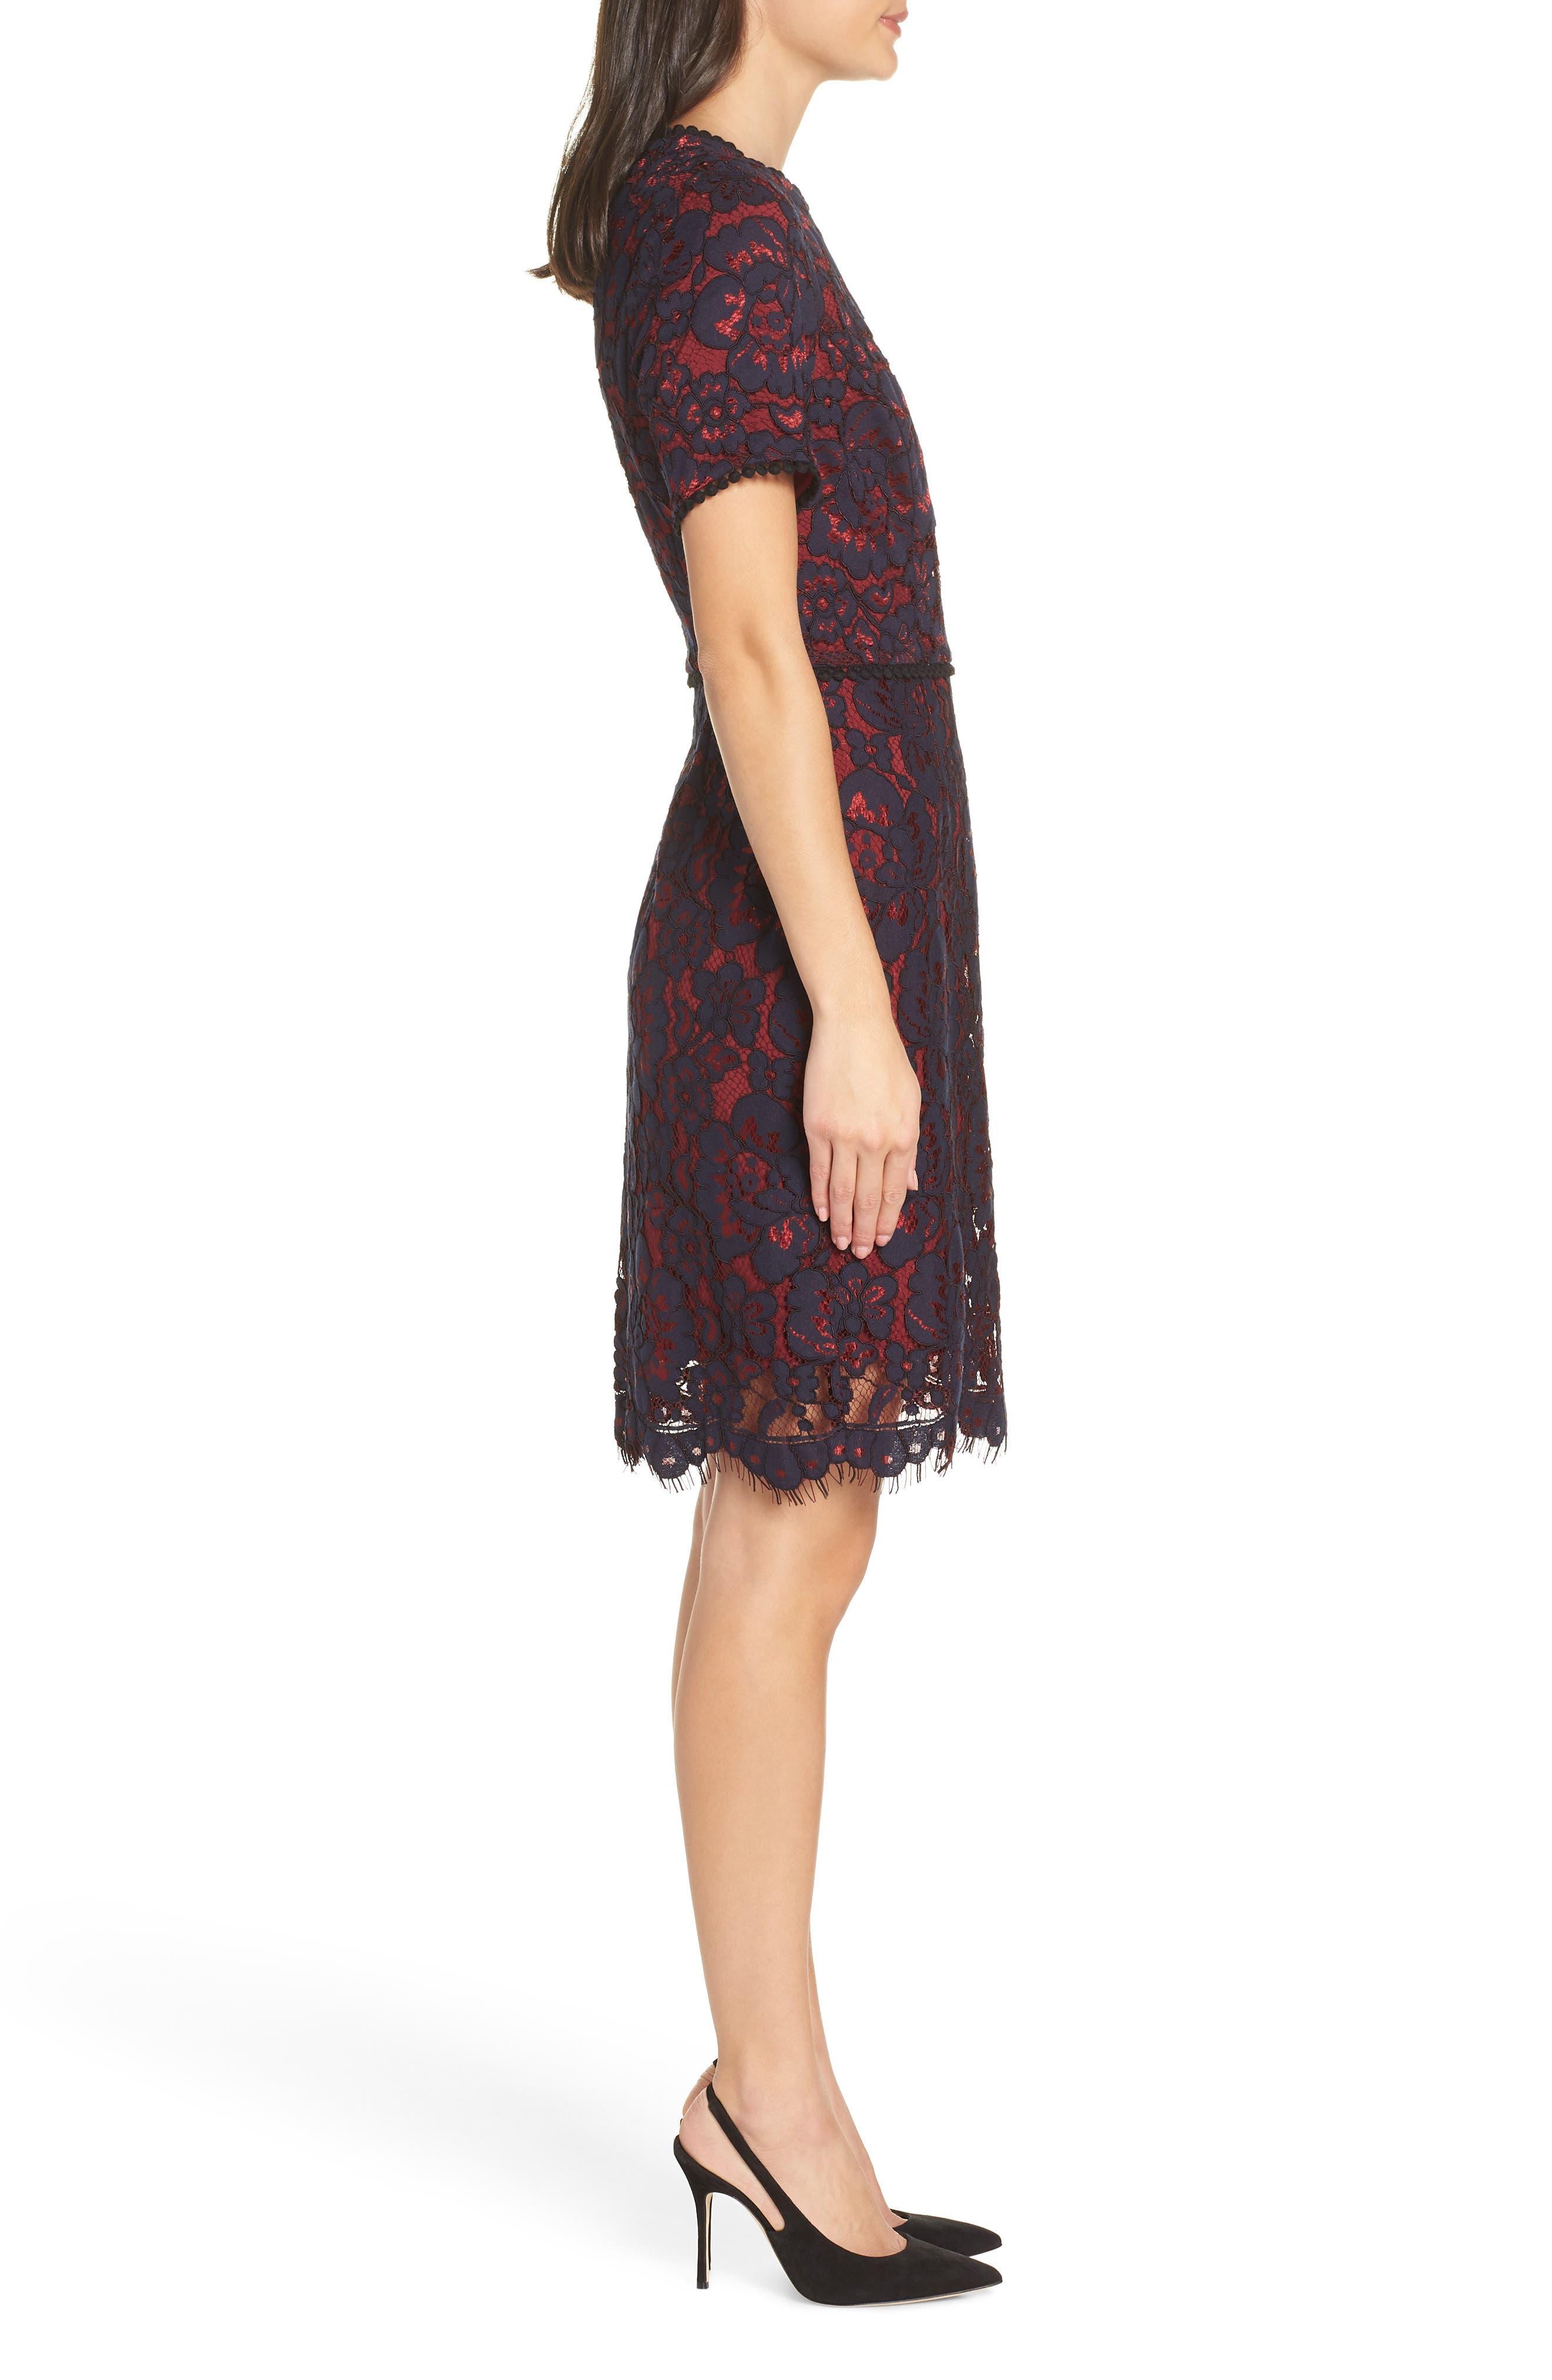 Lace Sheath Dress,                             Alternate thumbnail 3, color,                             NAVY/ WINE LACE